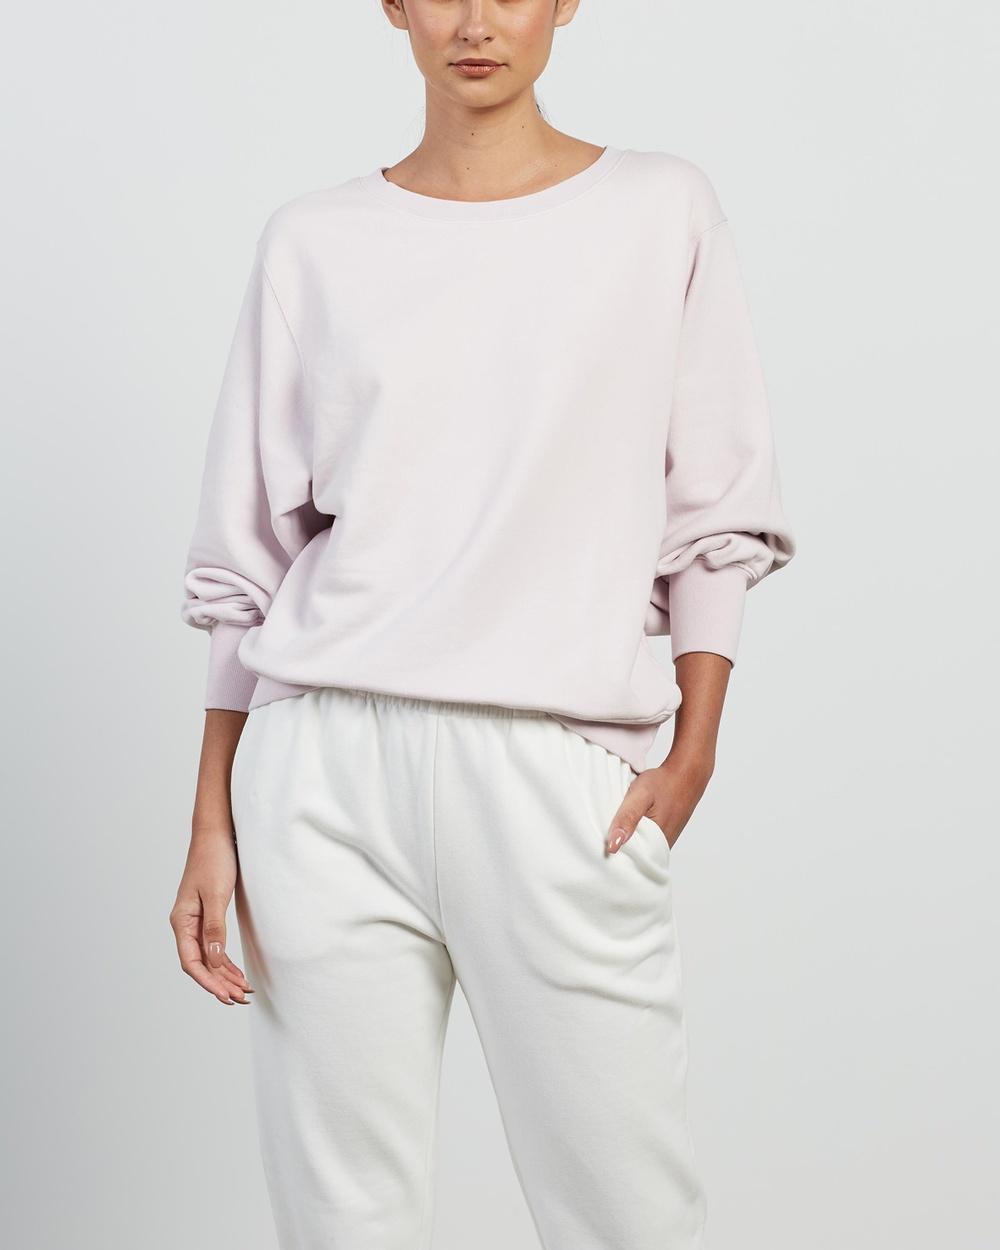 American Vintage Fobye Sweatshirt Sweats Vintage Baby Lilac